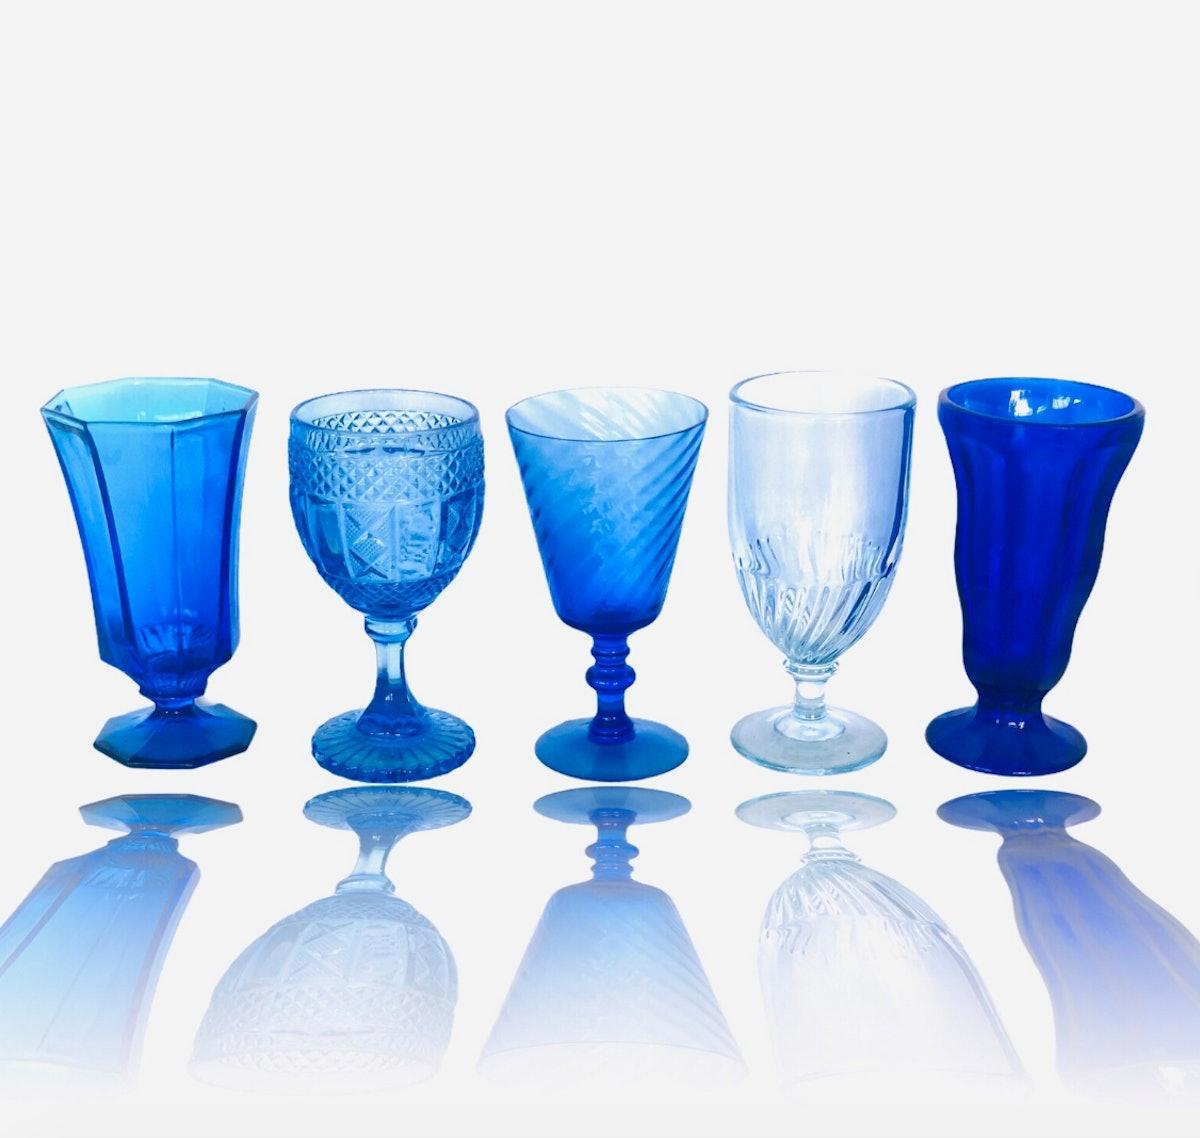 Mismatched Set of Colorful Blue Glassware